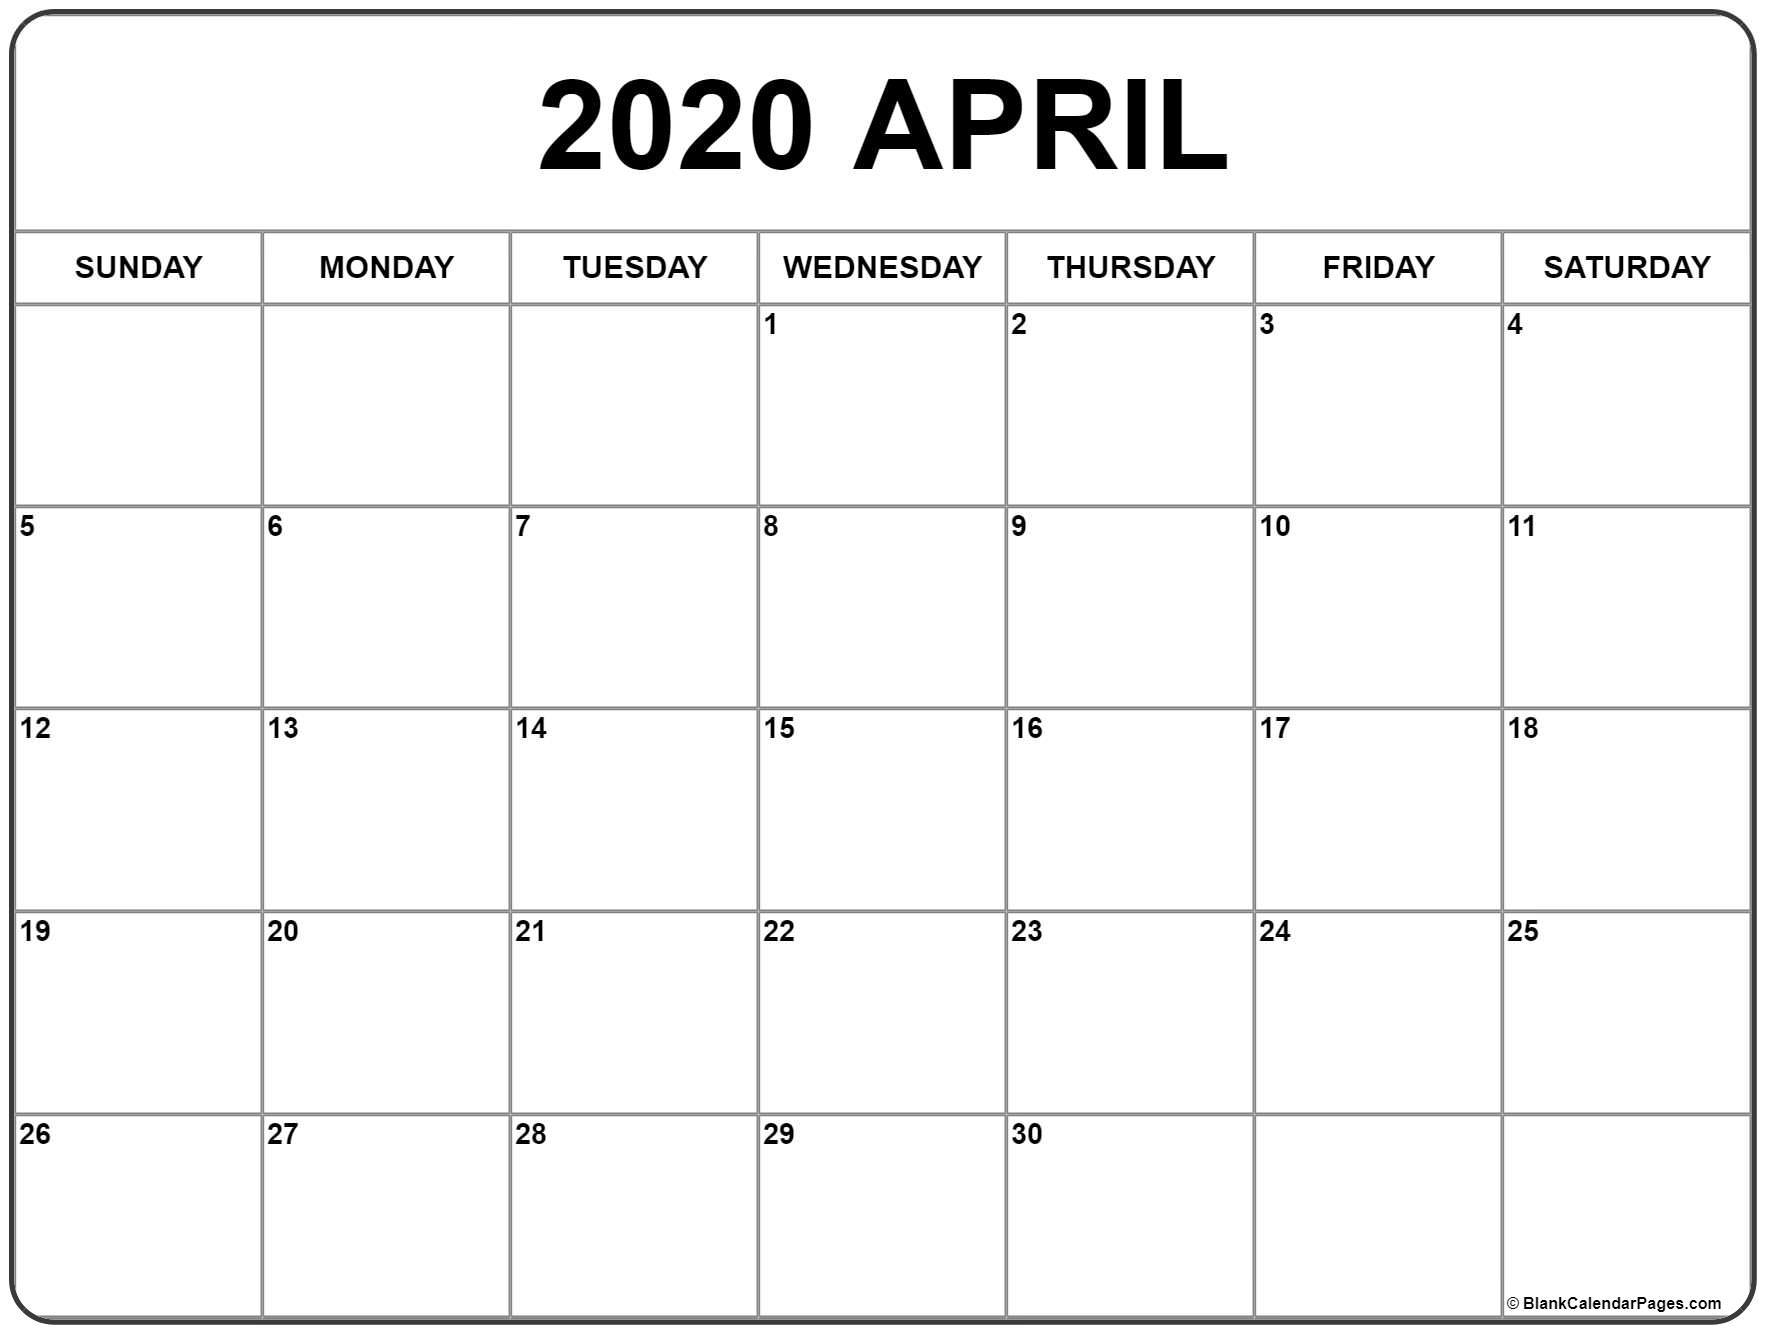 April 2020 Calendar   Free Printable Monthly Calendars